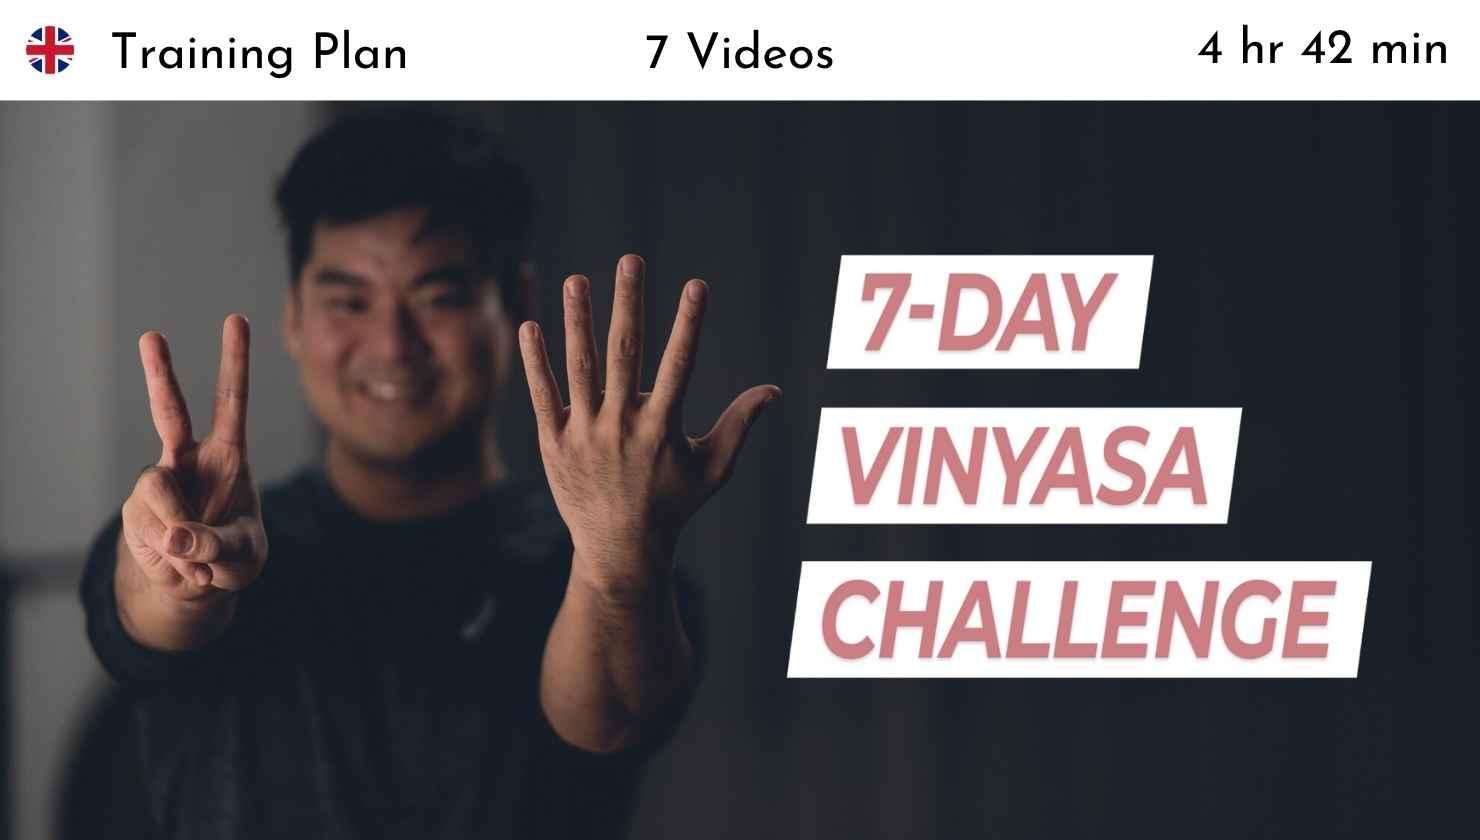 7-Day Vinyasa Challenge Hie Kim